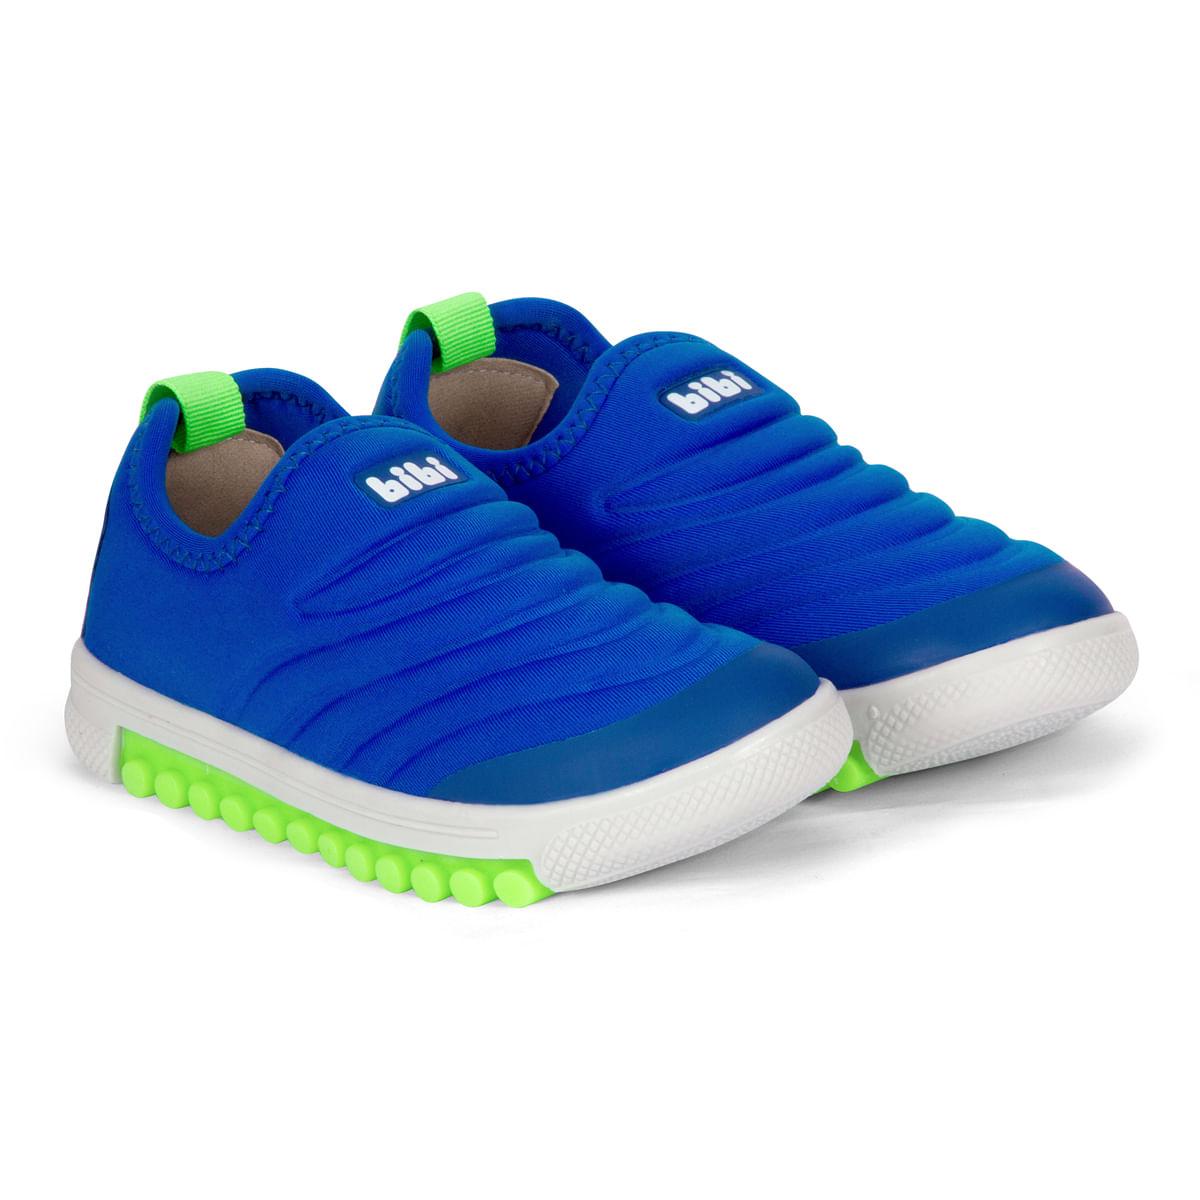 4b2ffe989db Tênis Infantil Masculino Bibi Azul Roller New 679463 - Bibi Calçados